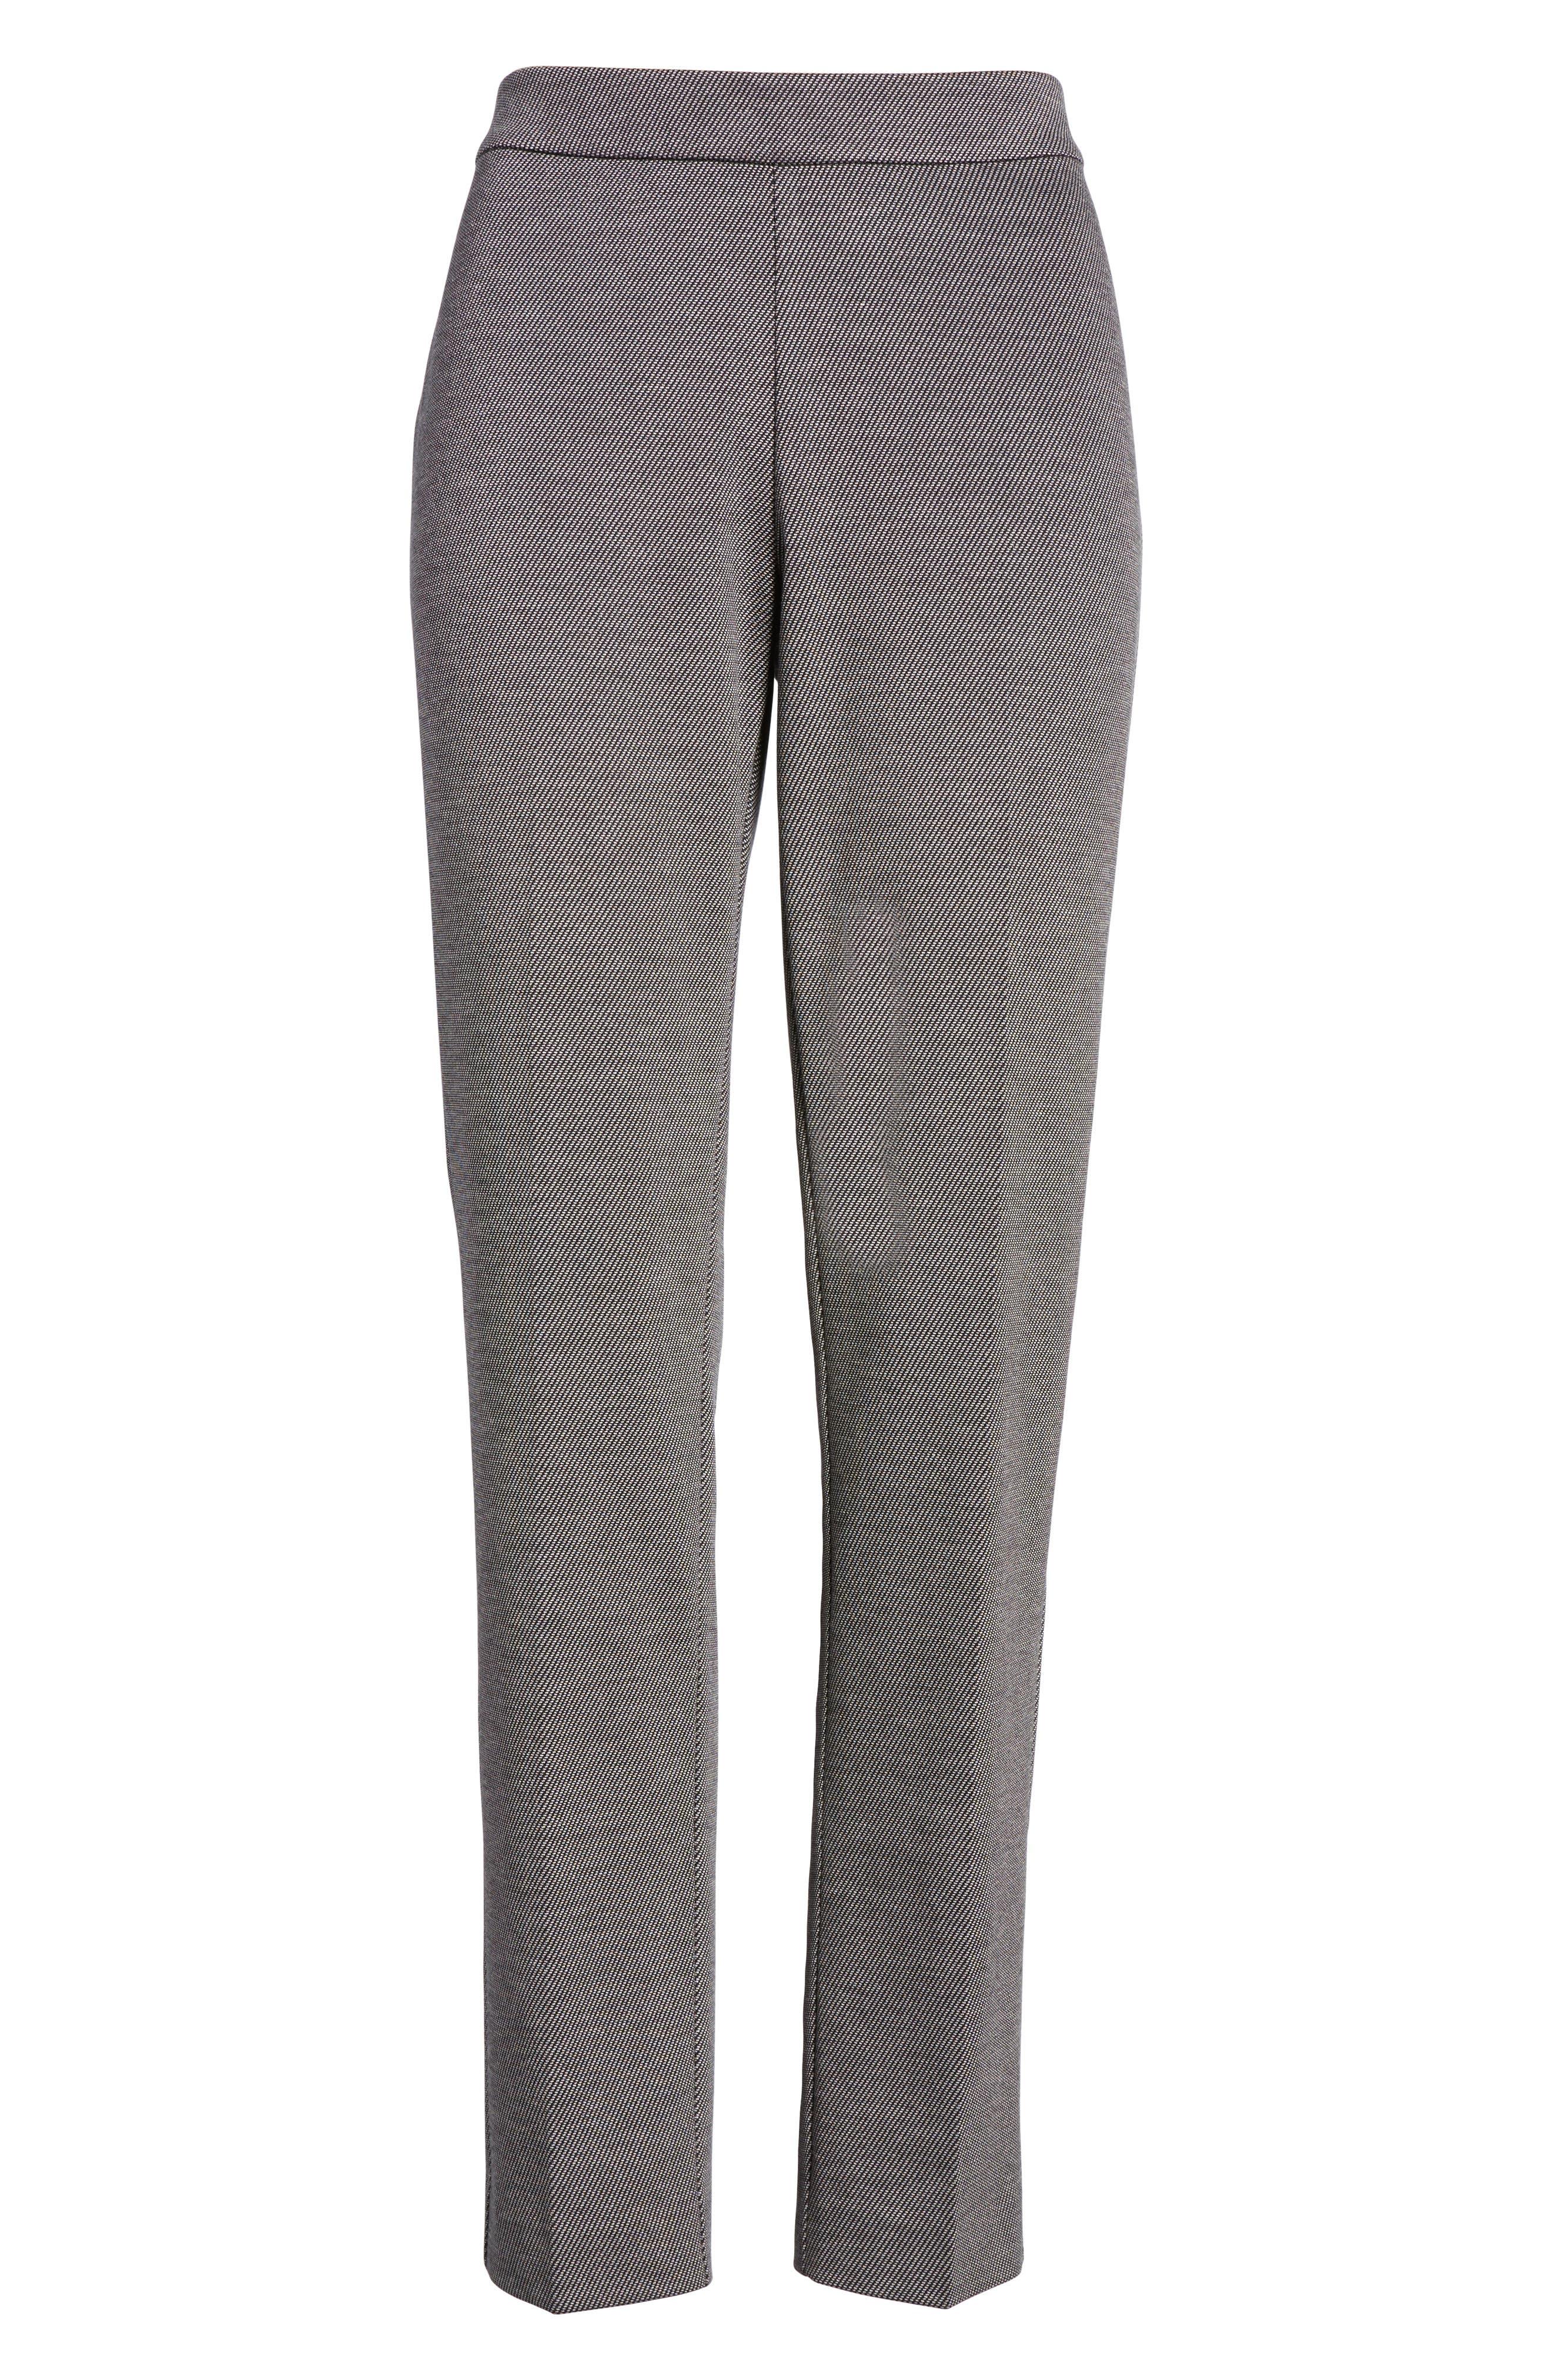 Slim Twill Ponte Knit Pants,                             Alternate thumbnail 6, color,                             020